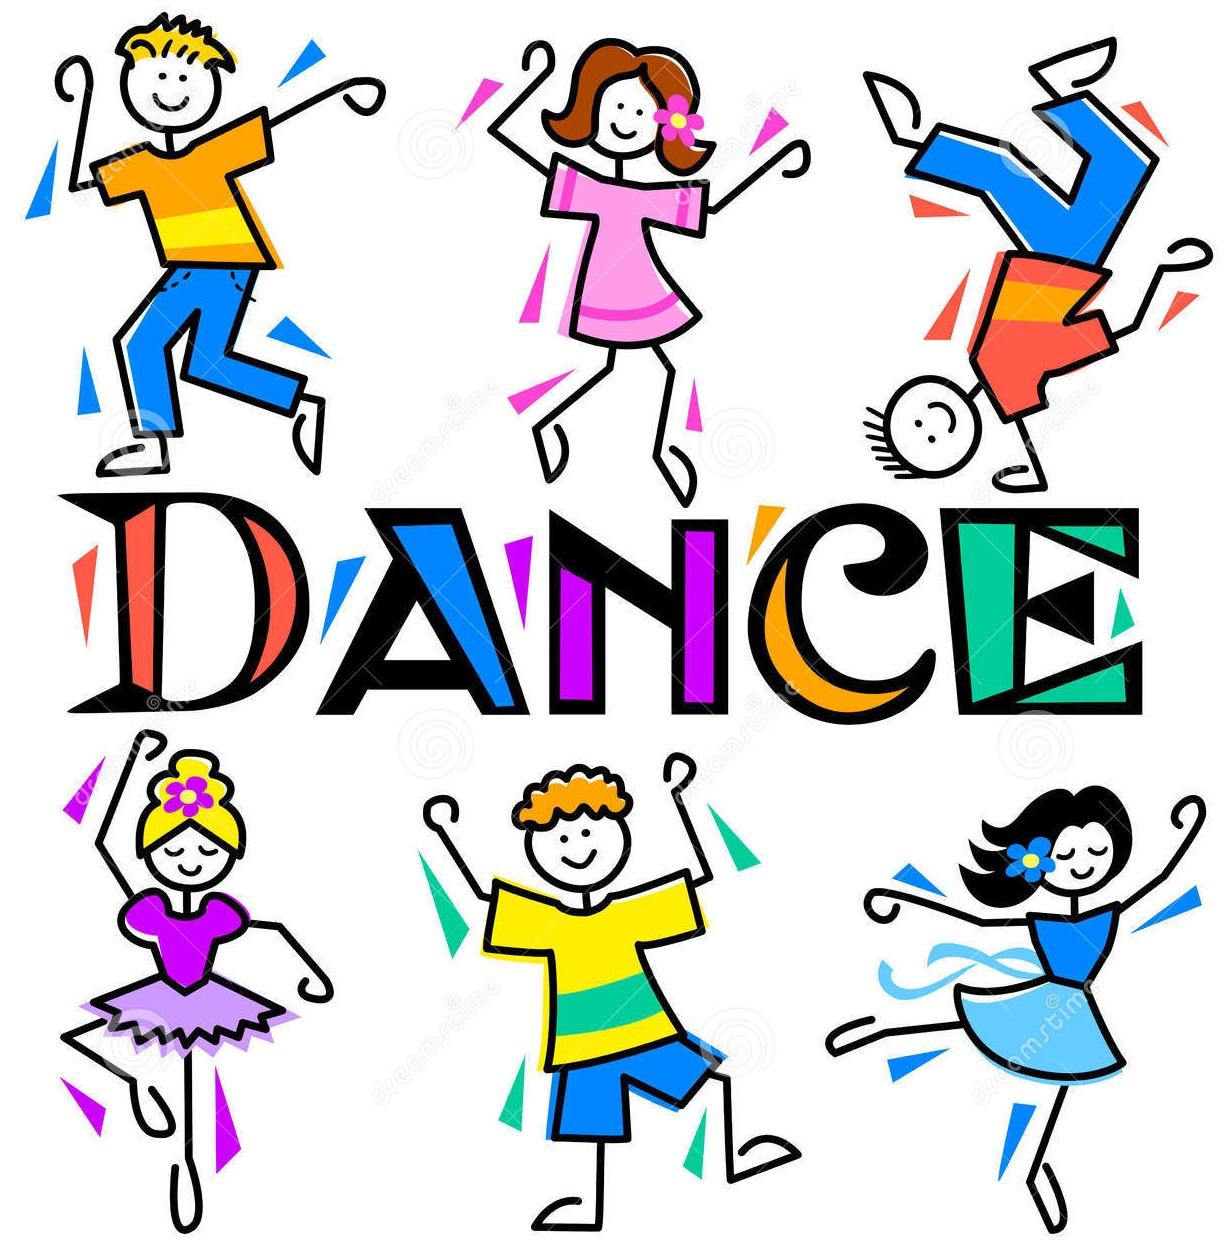 child-dancer-clipart-cartoon-kids-dance-eps-22779579